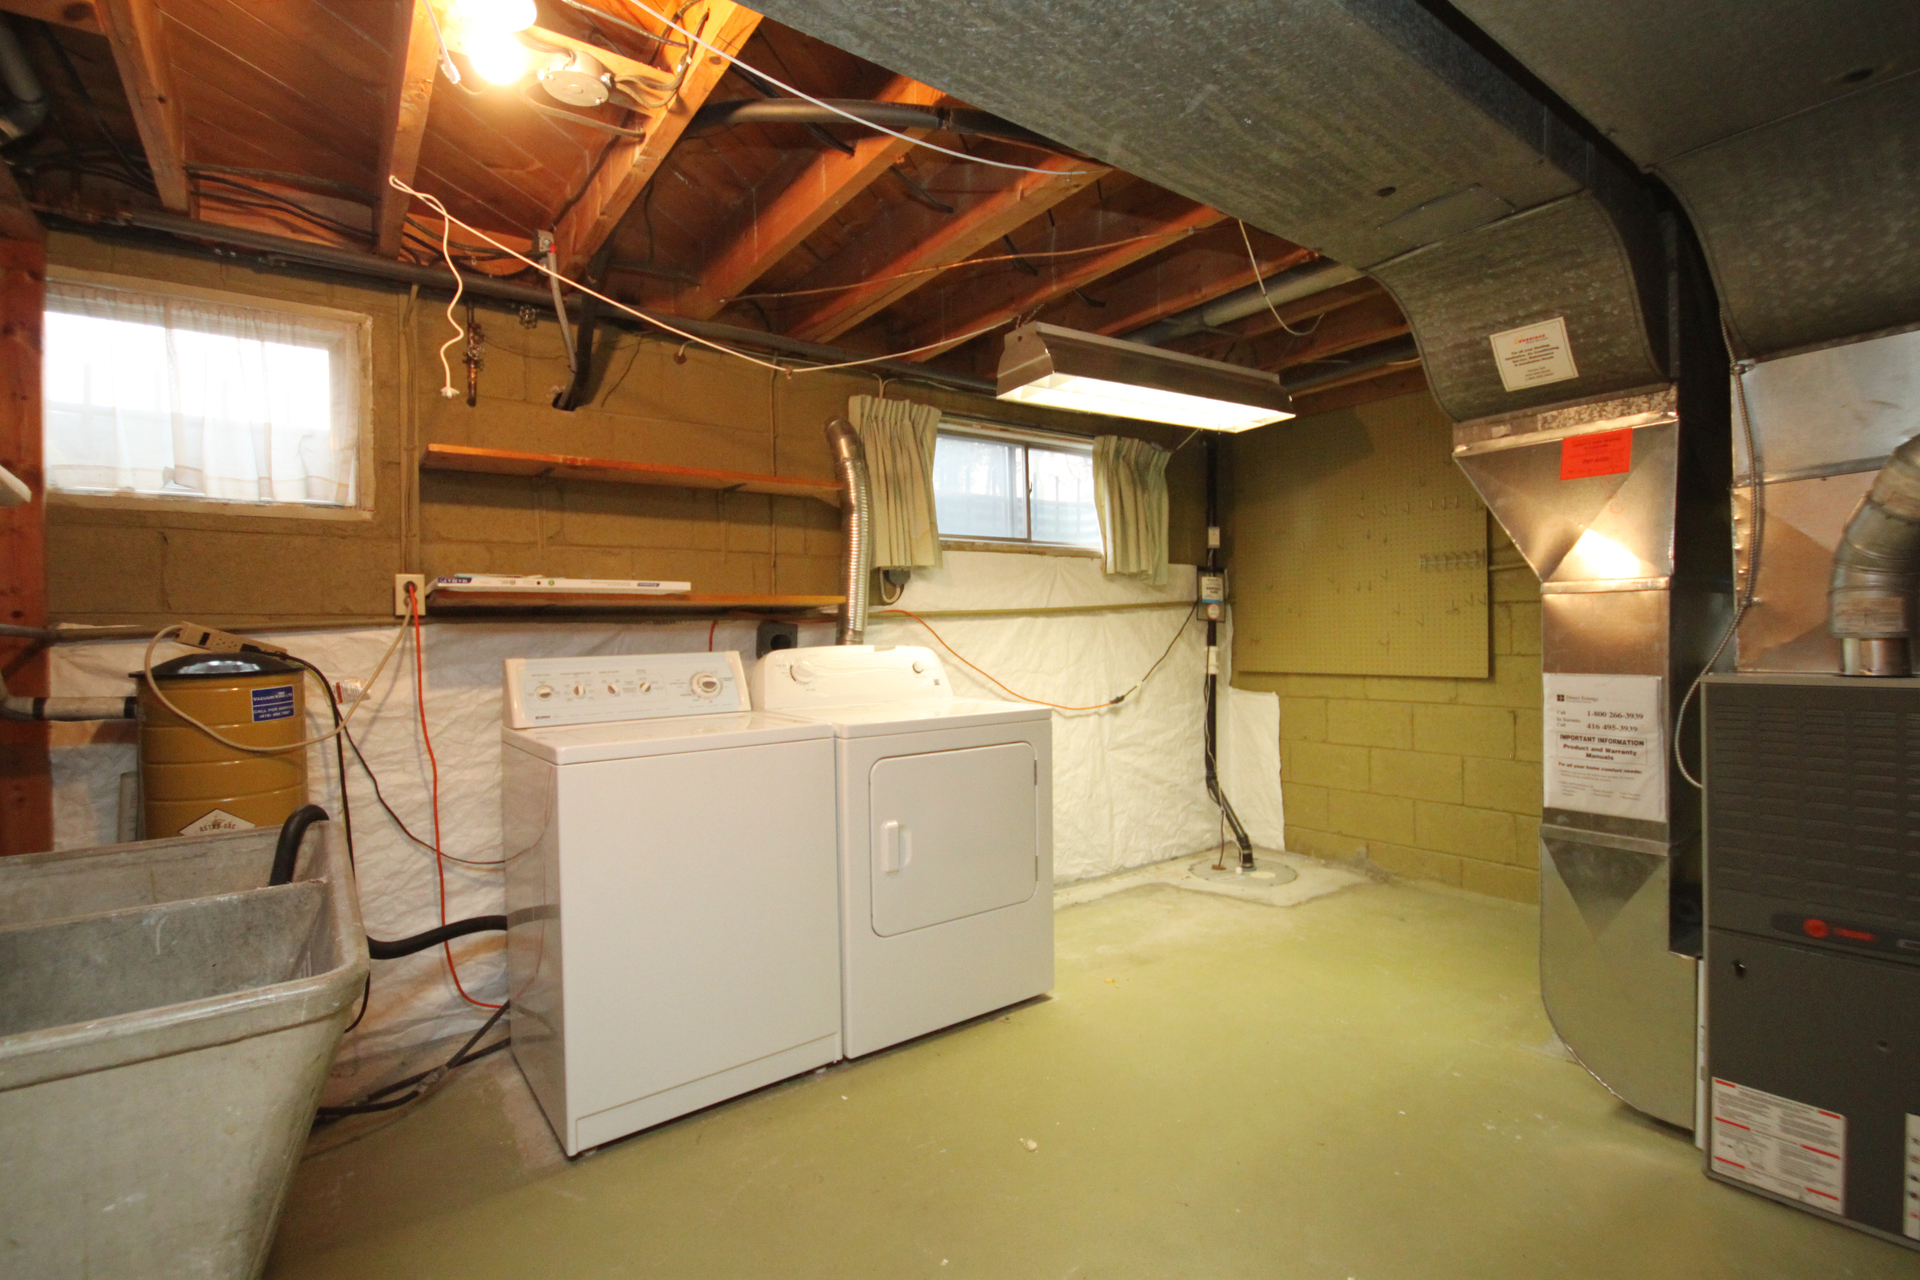 Laundry Room at 110 Plateau Crescent, Banbury-Don Mills, Toronto